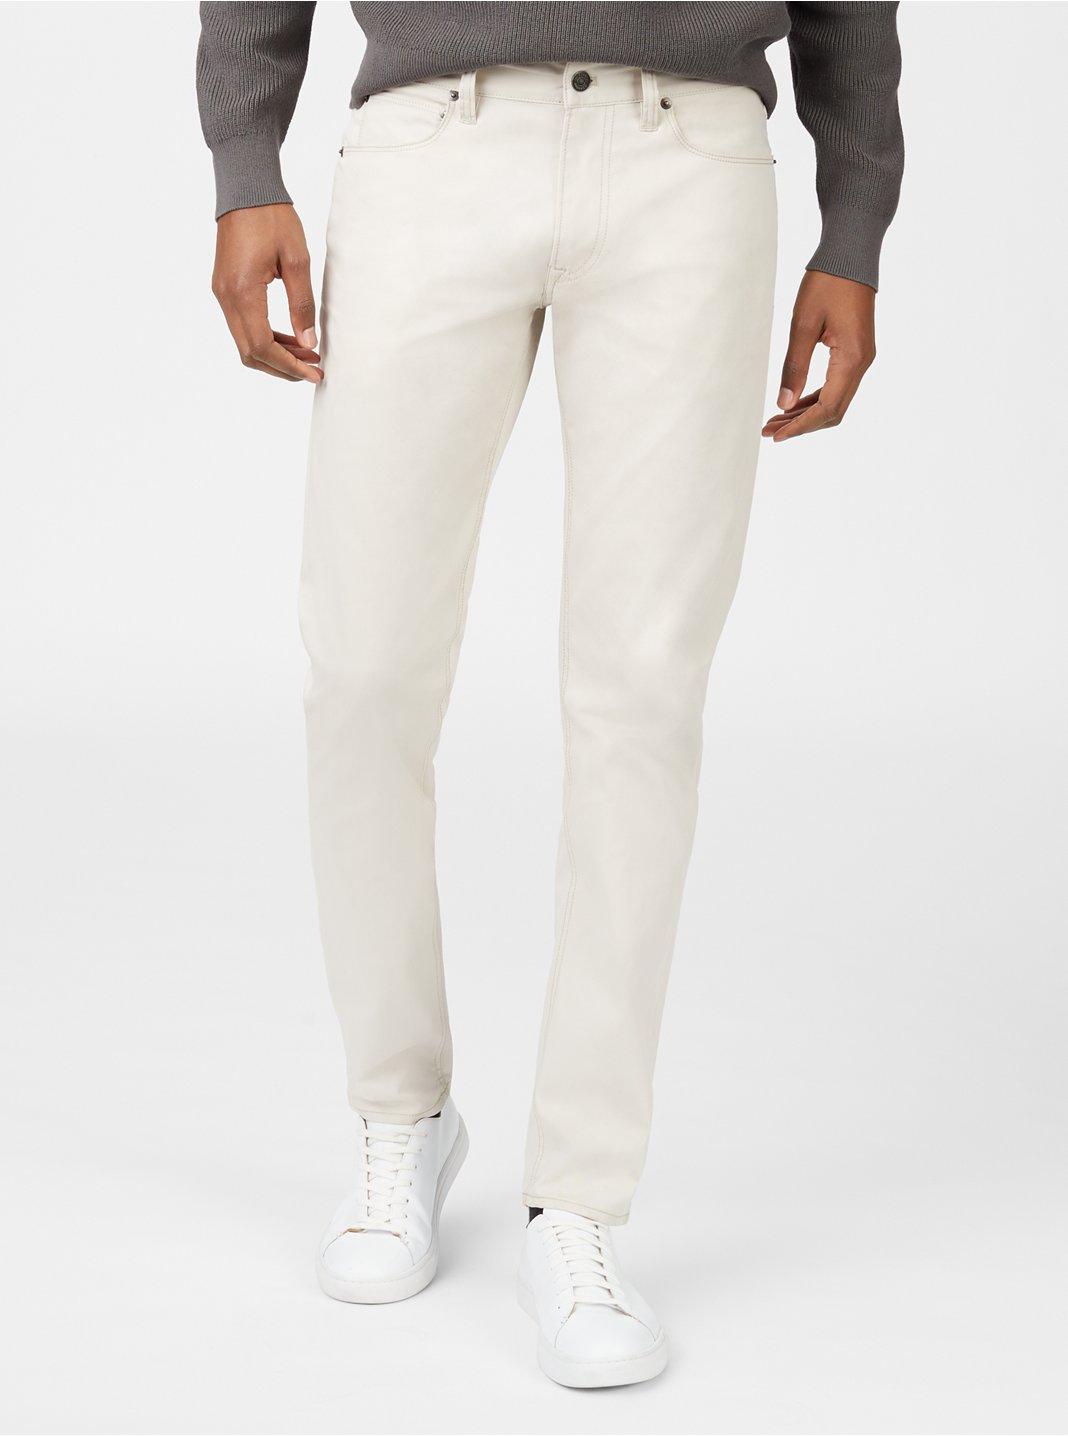 Super Slim Twill Pant